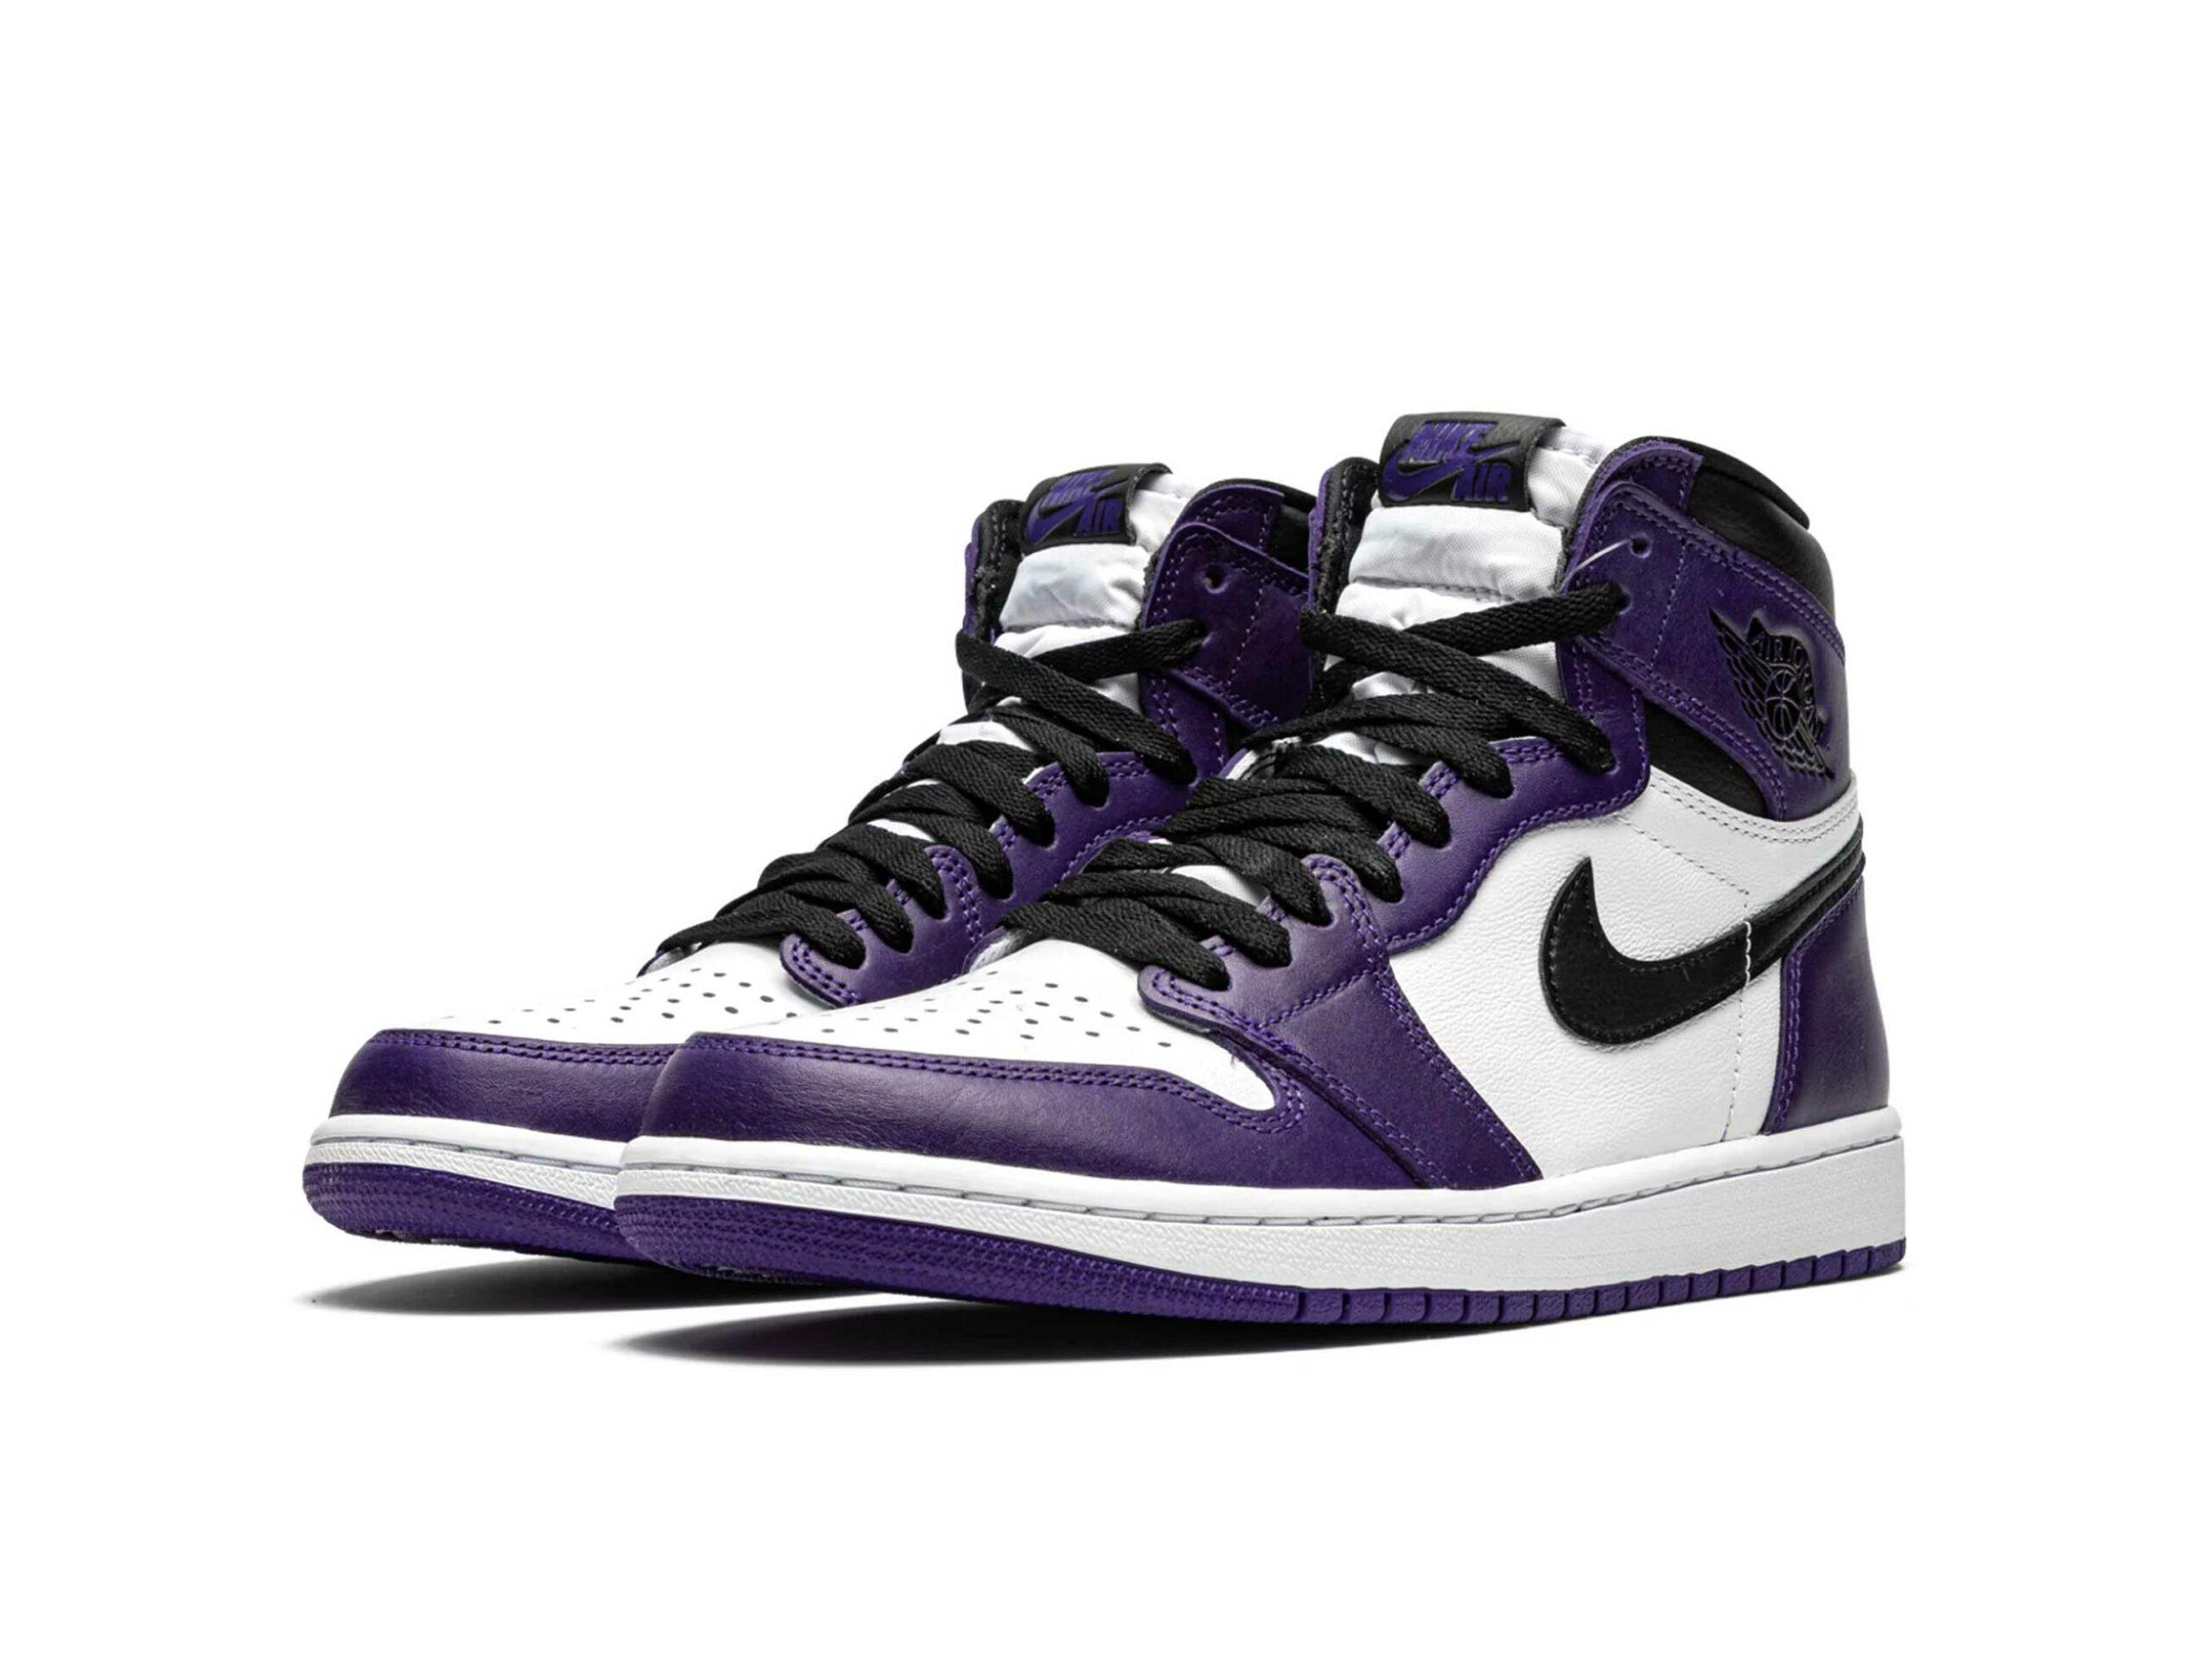 nike air Jordan 1 retro high og court purple 555088_500 купить